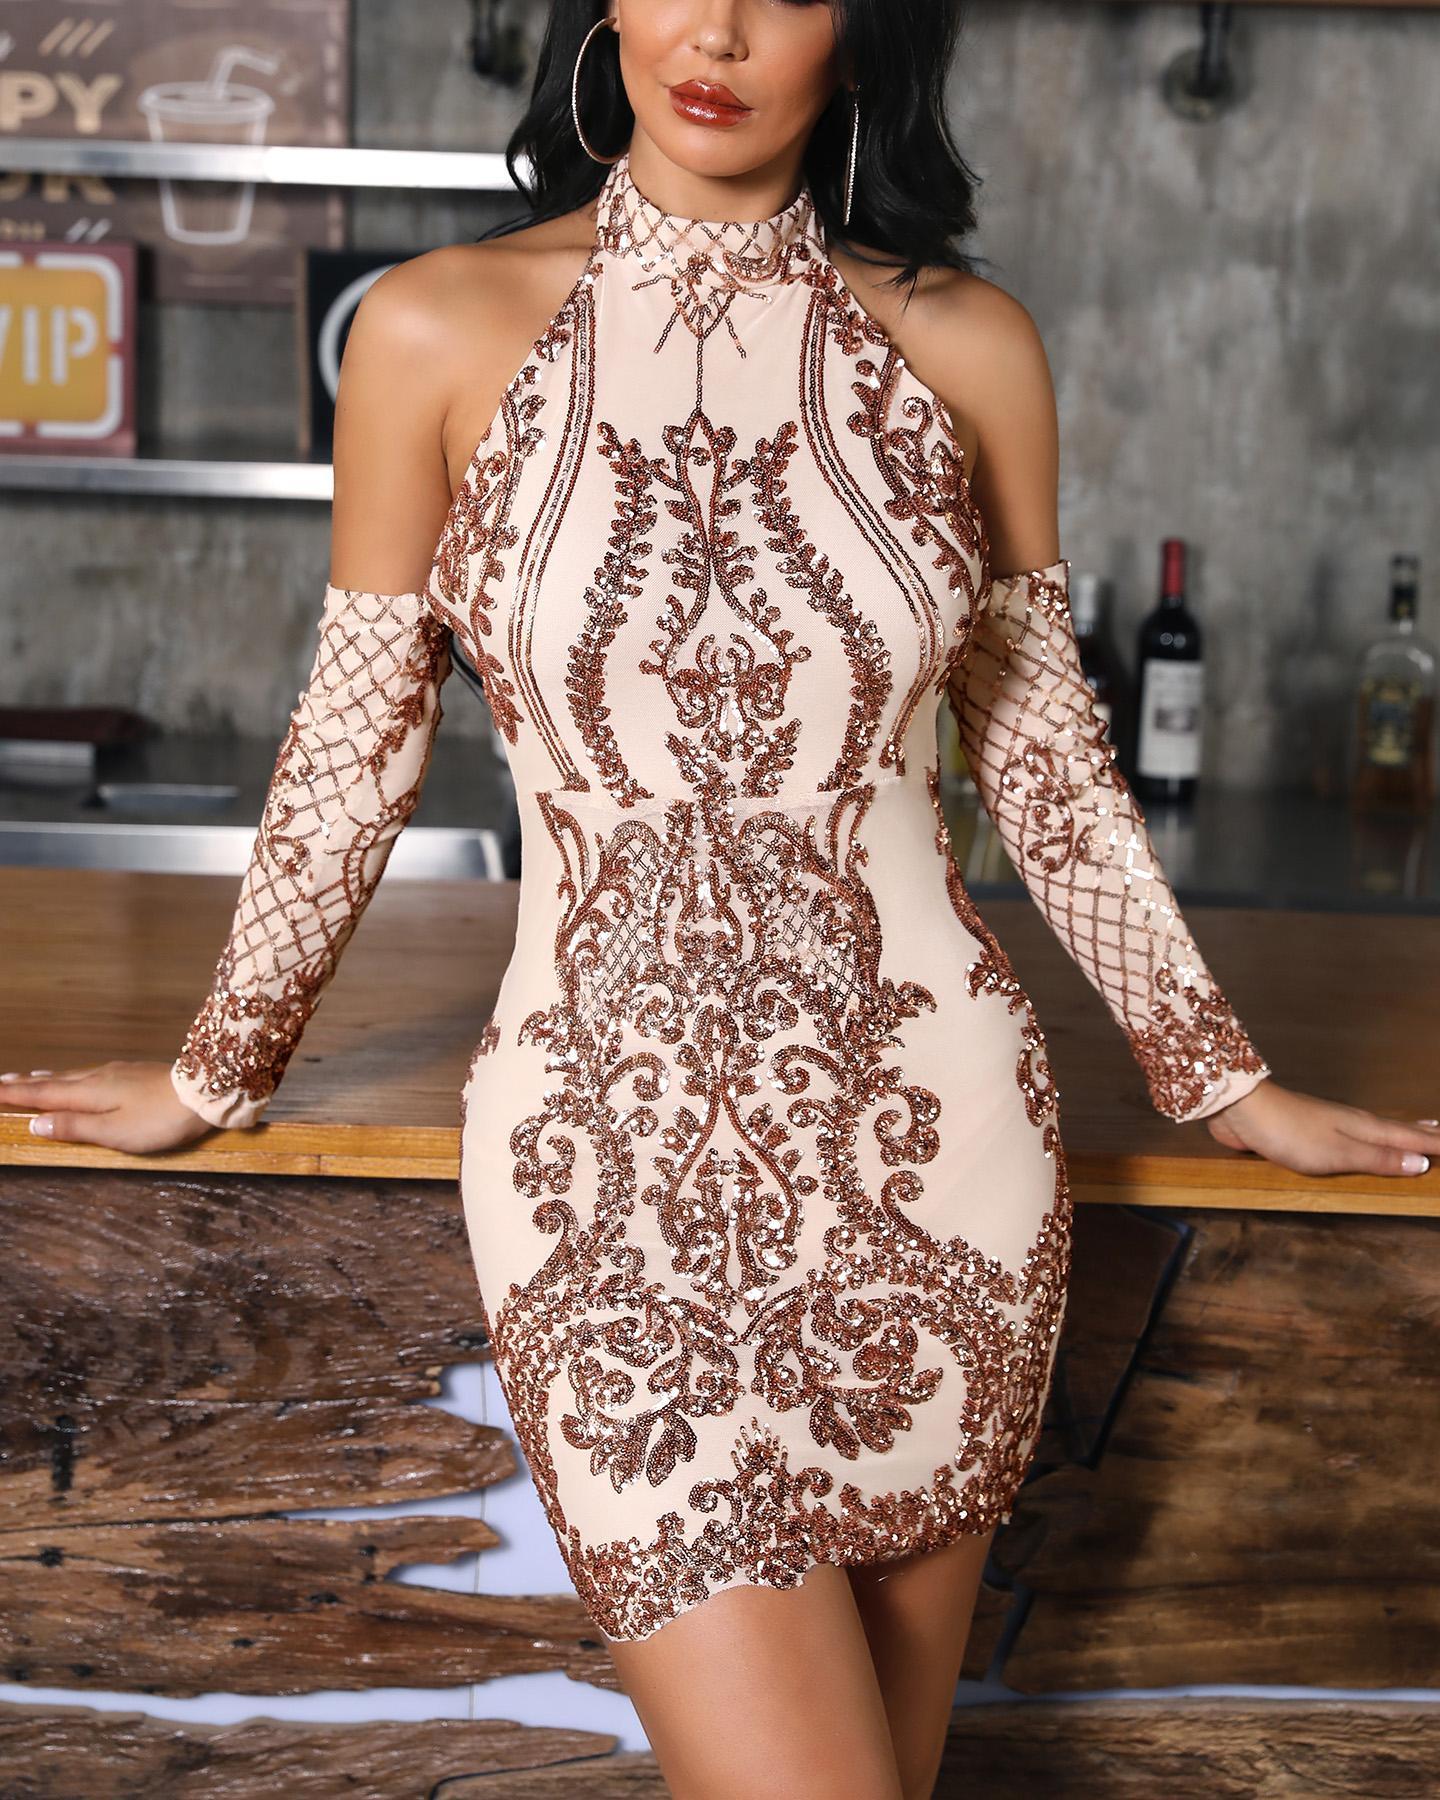 bdeacb190c25 Cold Shoulder Sequin Party Dress Online. Discover hottest trend ...